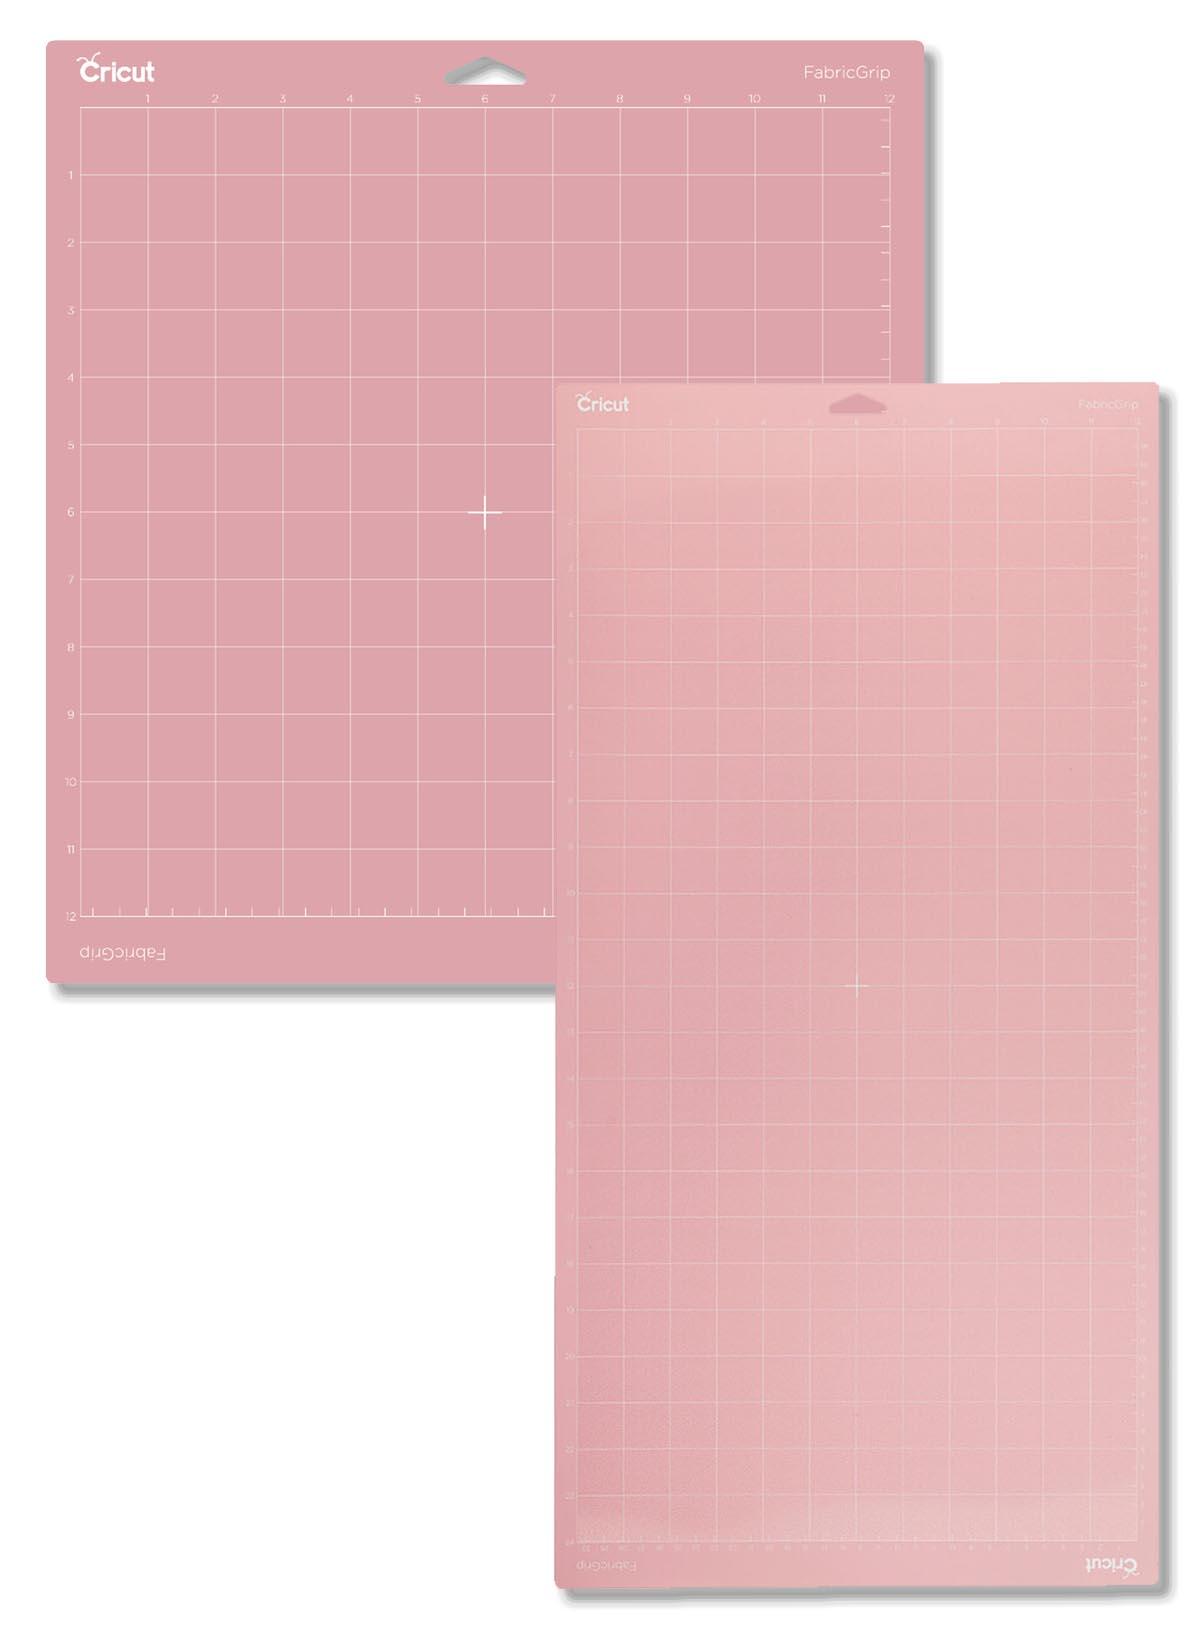 Pink Fabric Mat Both sizes 12x12 ans 12x24